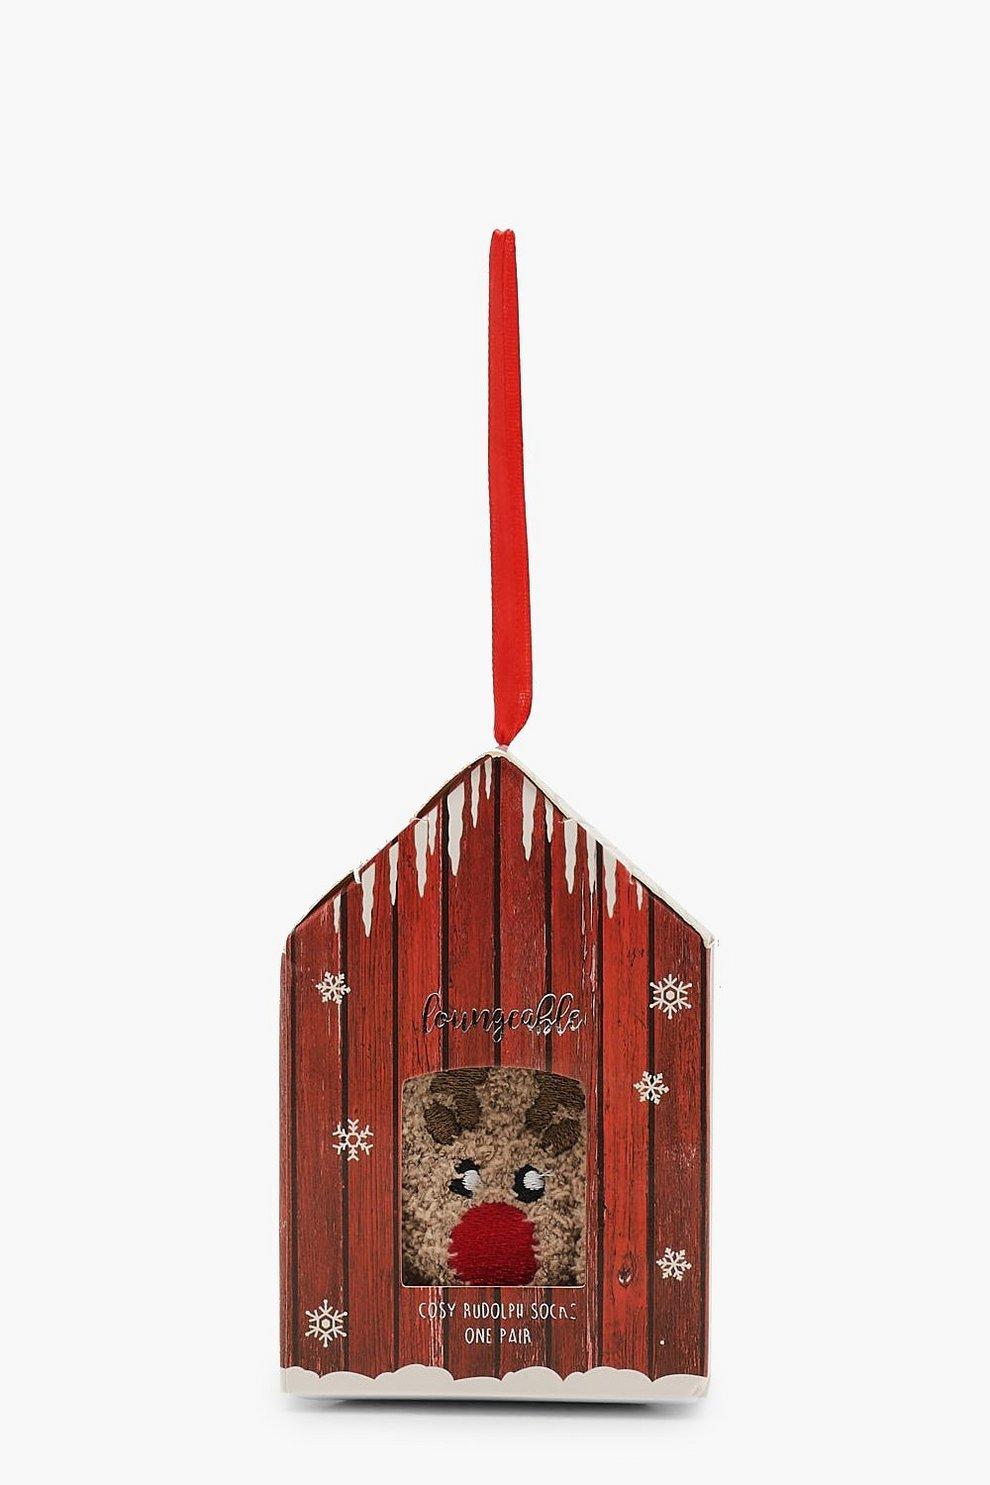 Weihnachten Rudolph Socken Geschenkverpackung | Boohoo